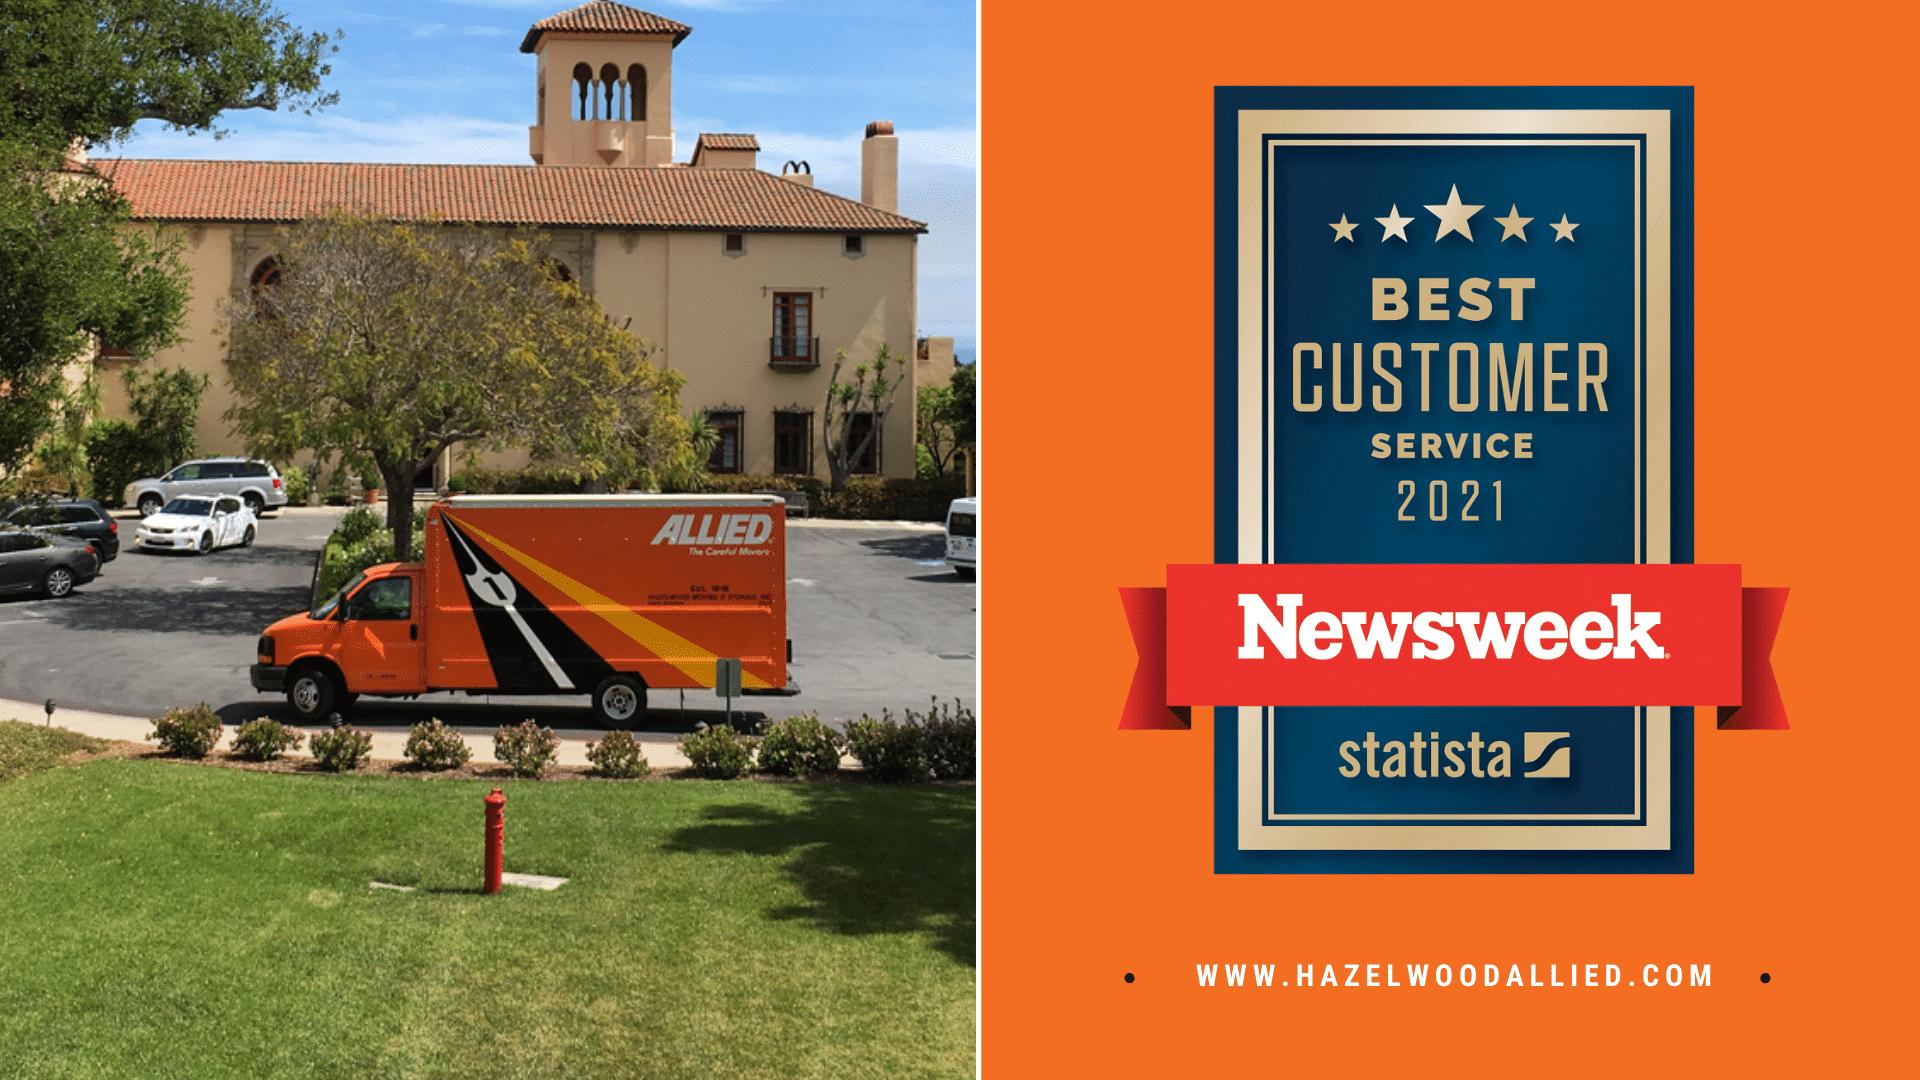 Santa Barbara Movers Voted Best Customer Service